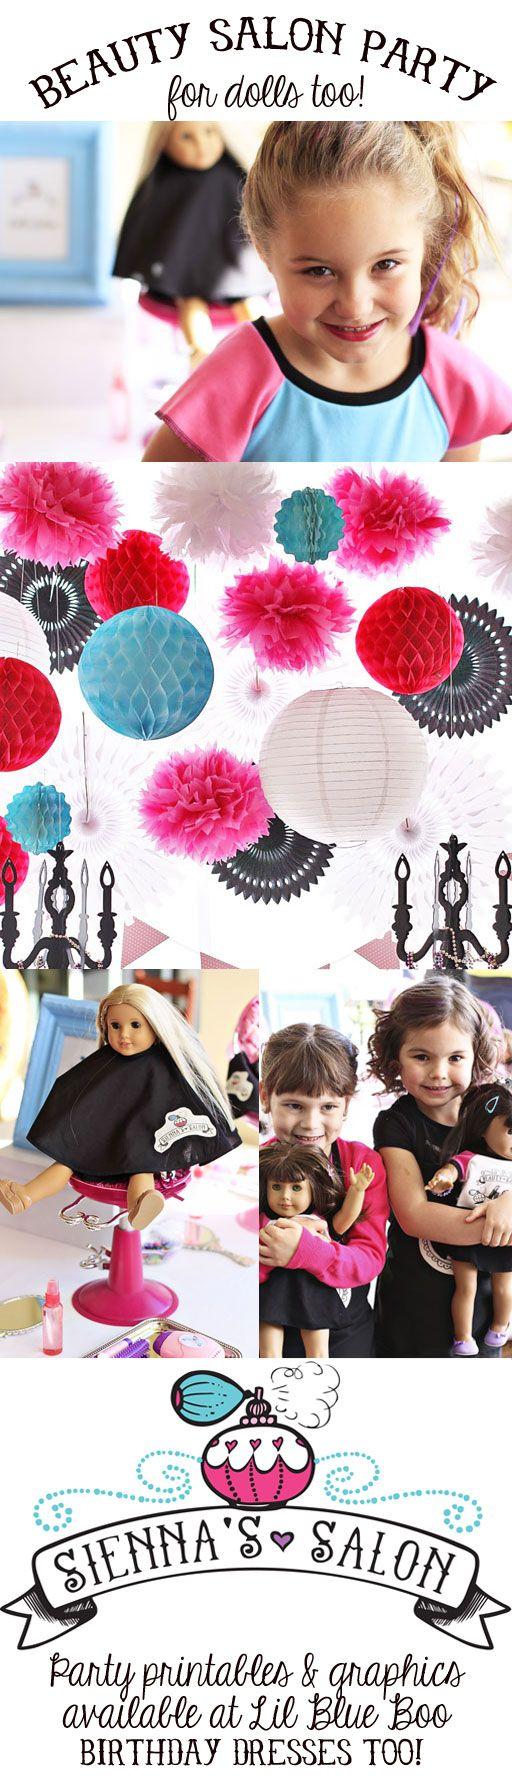 Beauty Salon Party (with American Girl Salon too!) via lilblueboo.com #americangirl #party #diy